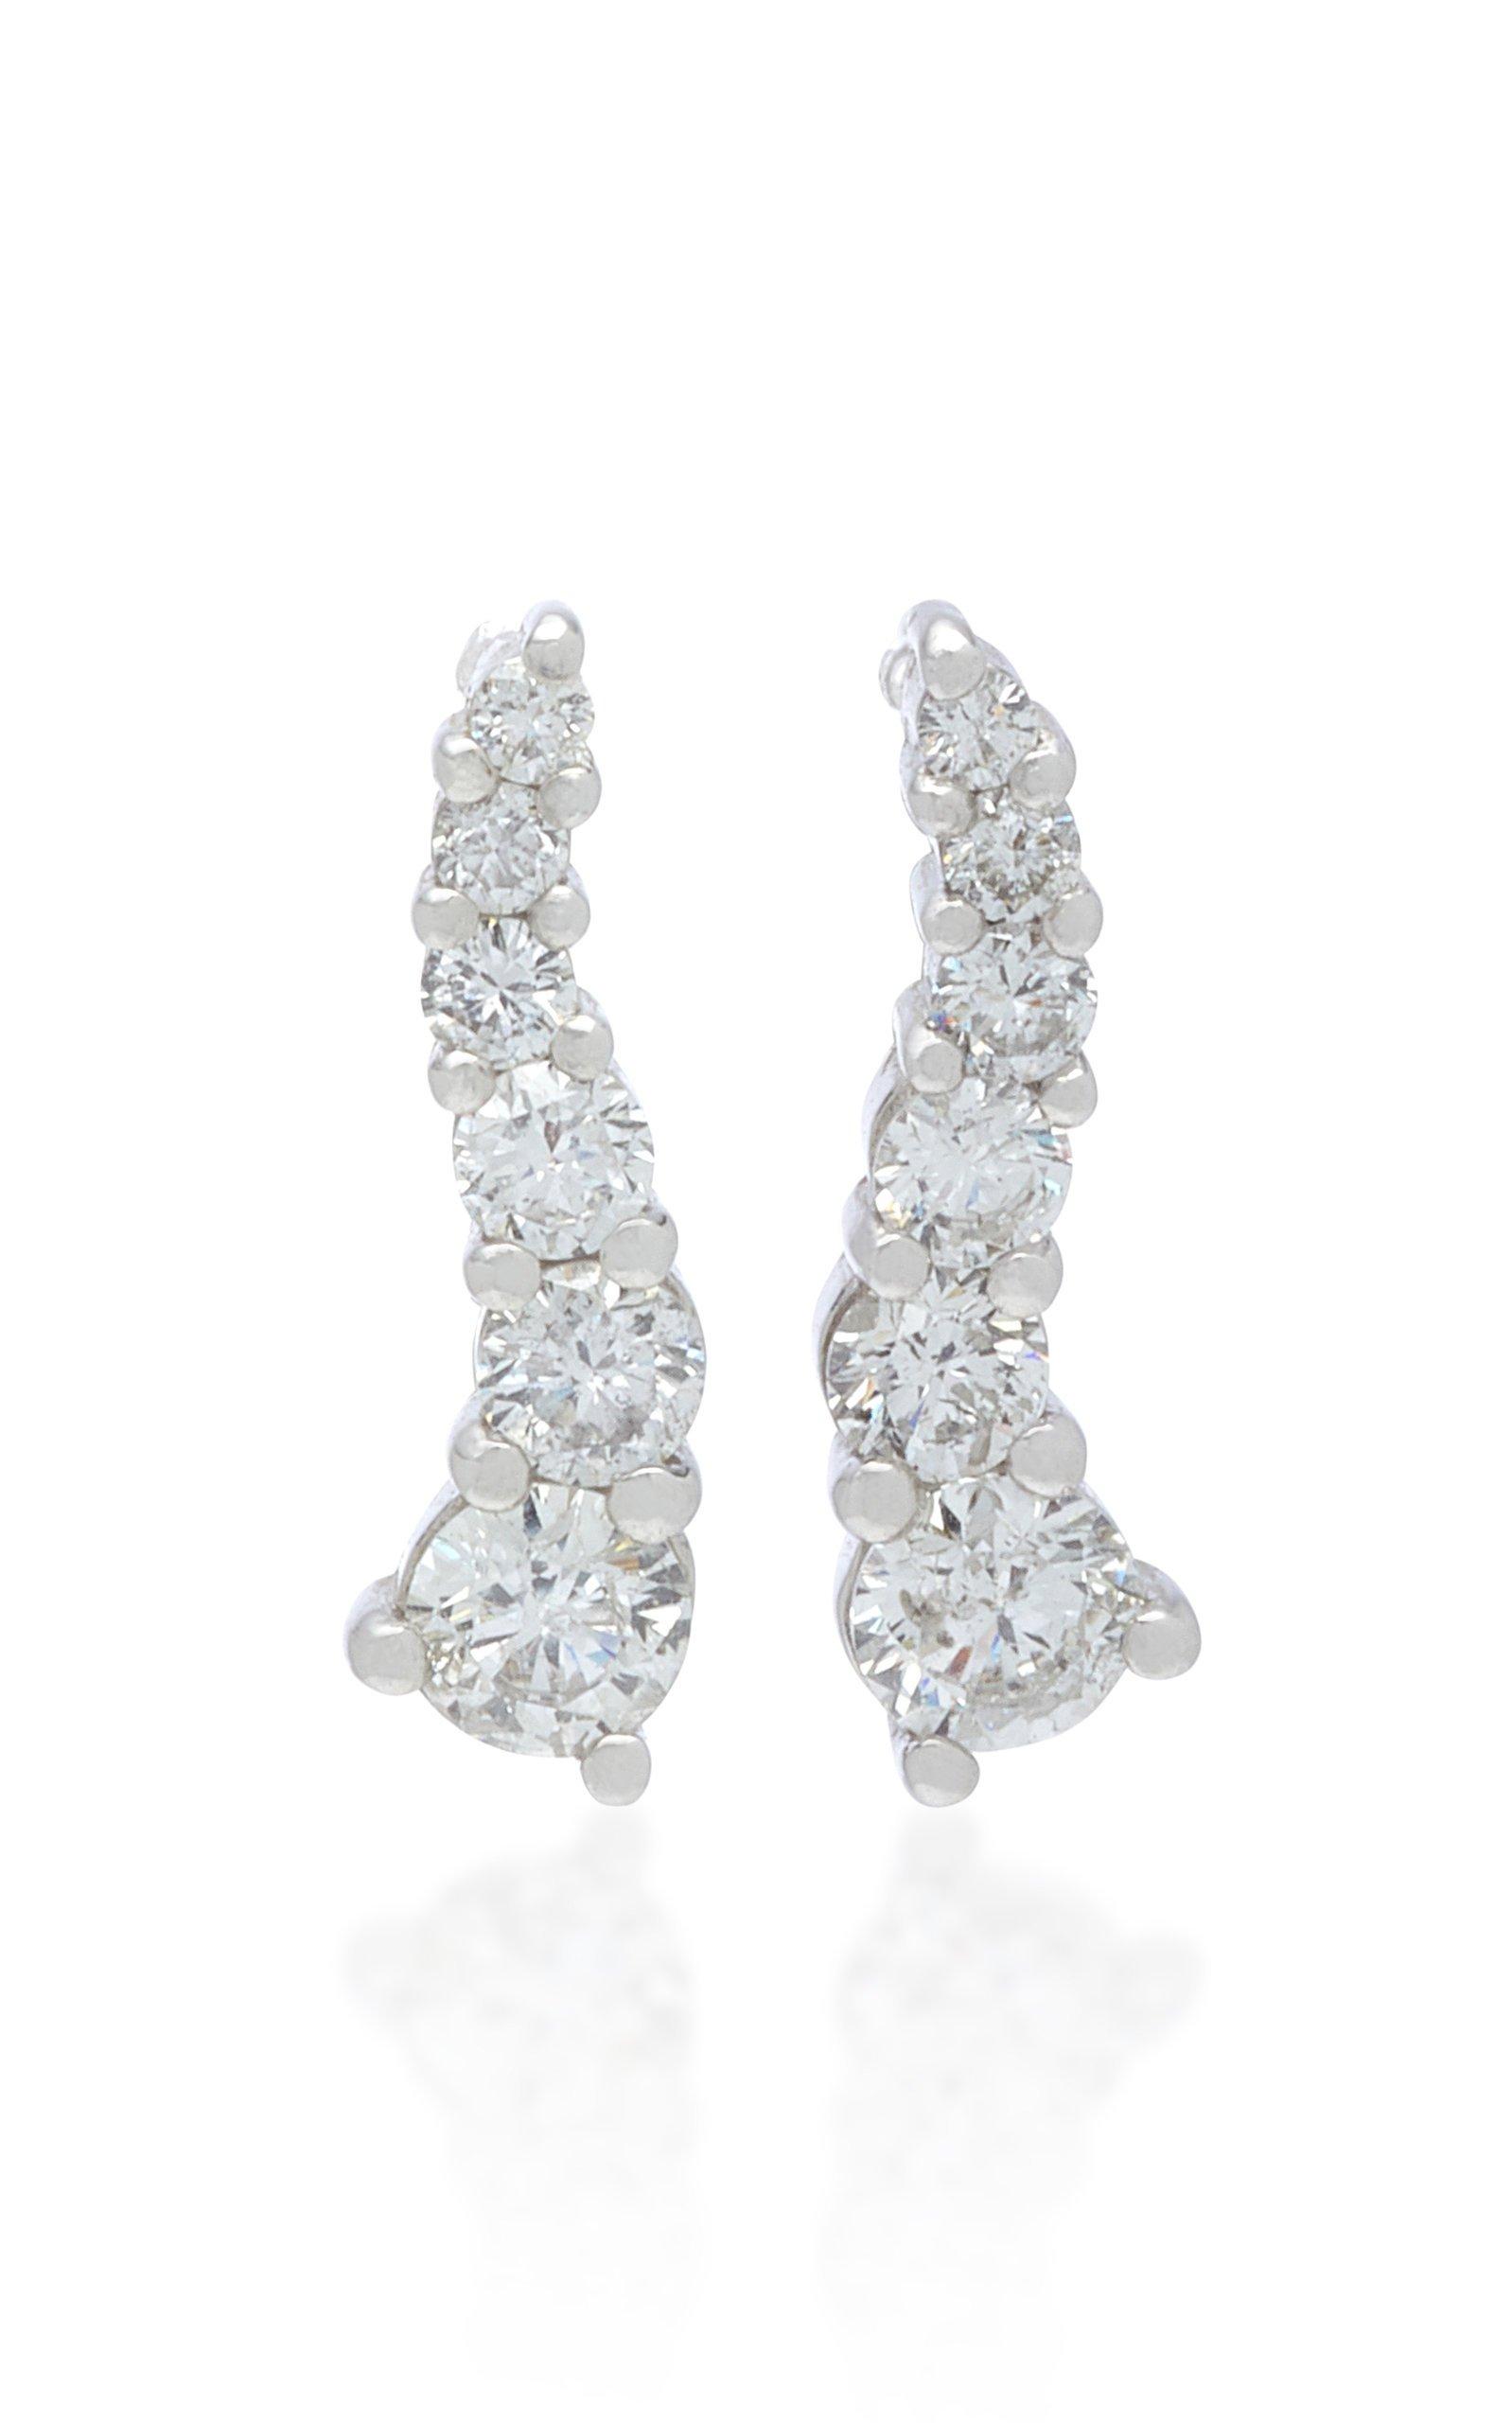 LYNN BAN Larvae Sterling Silver and Diamond Earrings